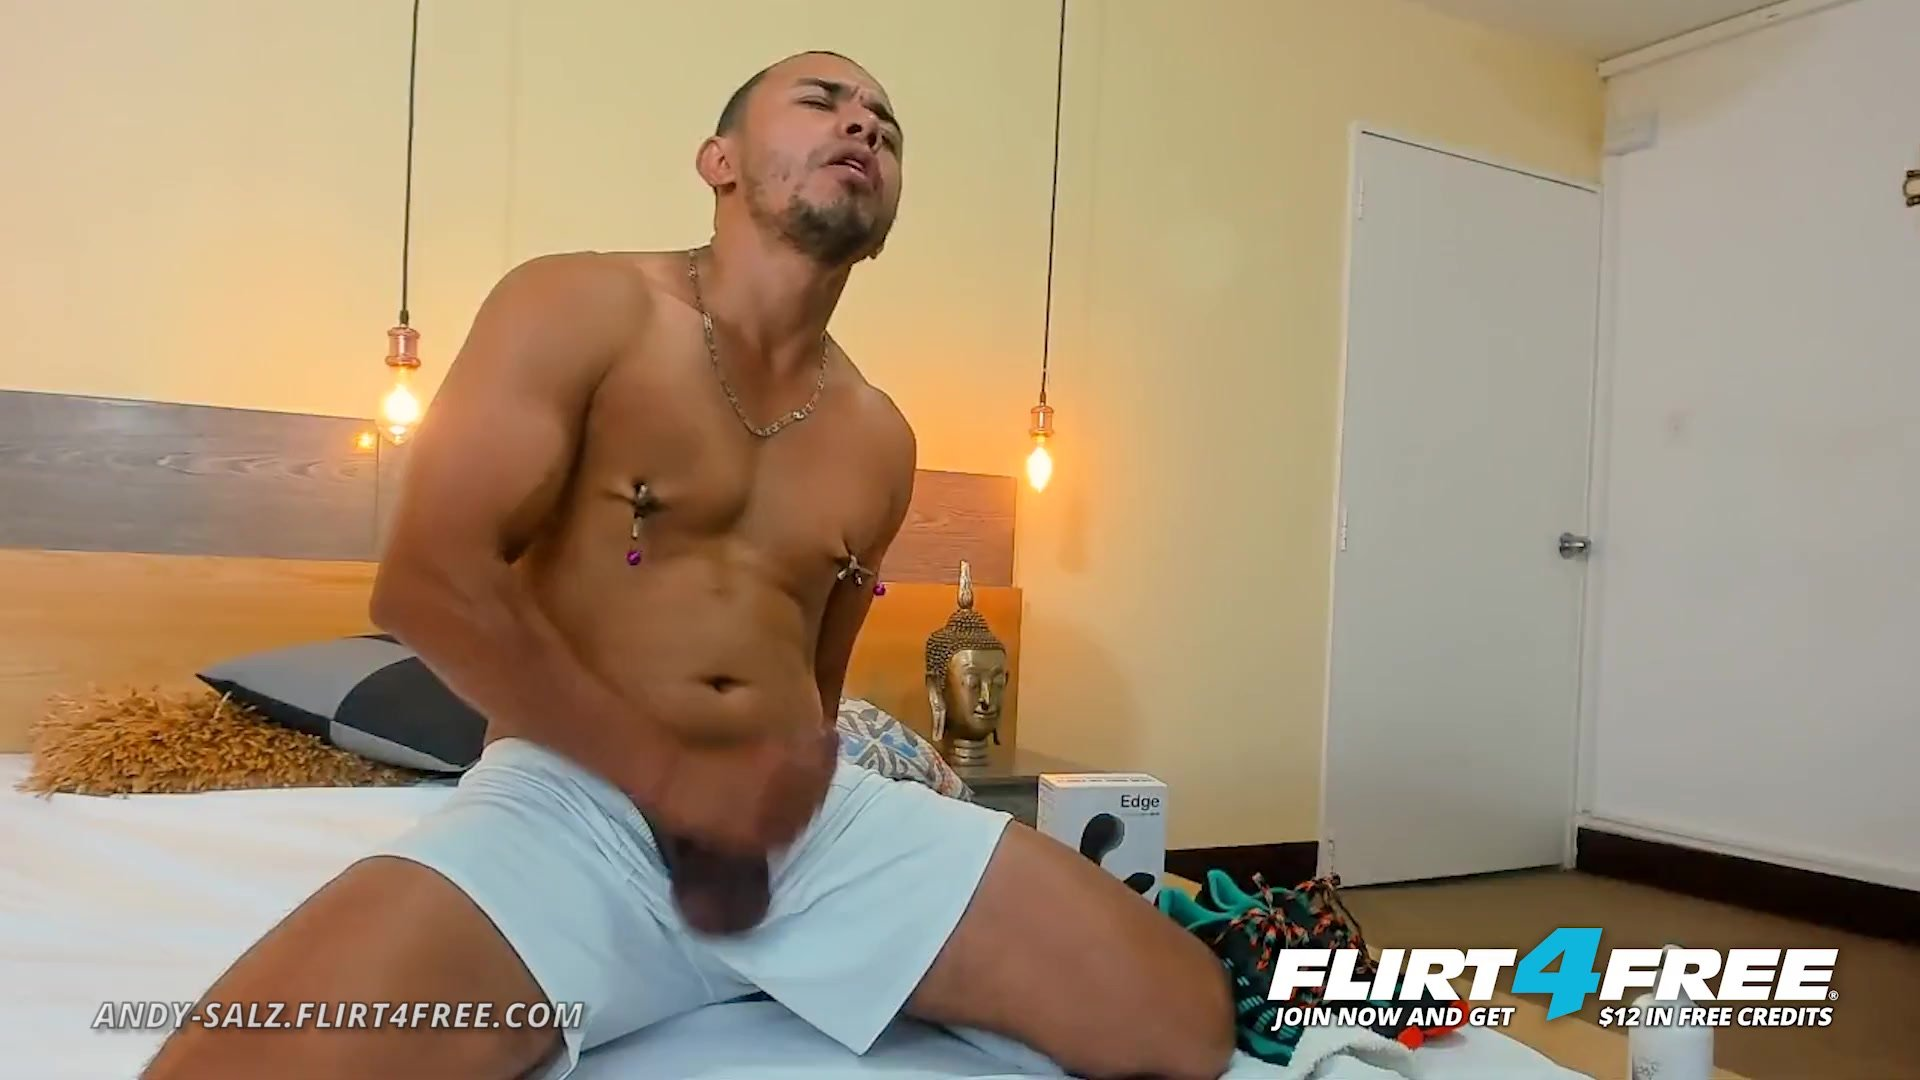 Big cock/jerks flirt4free clamps off